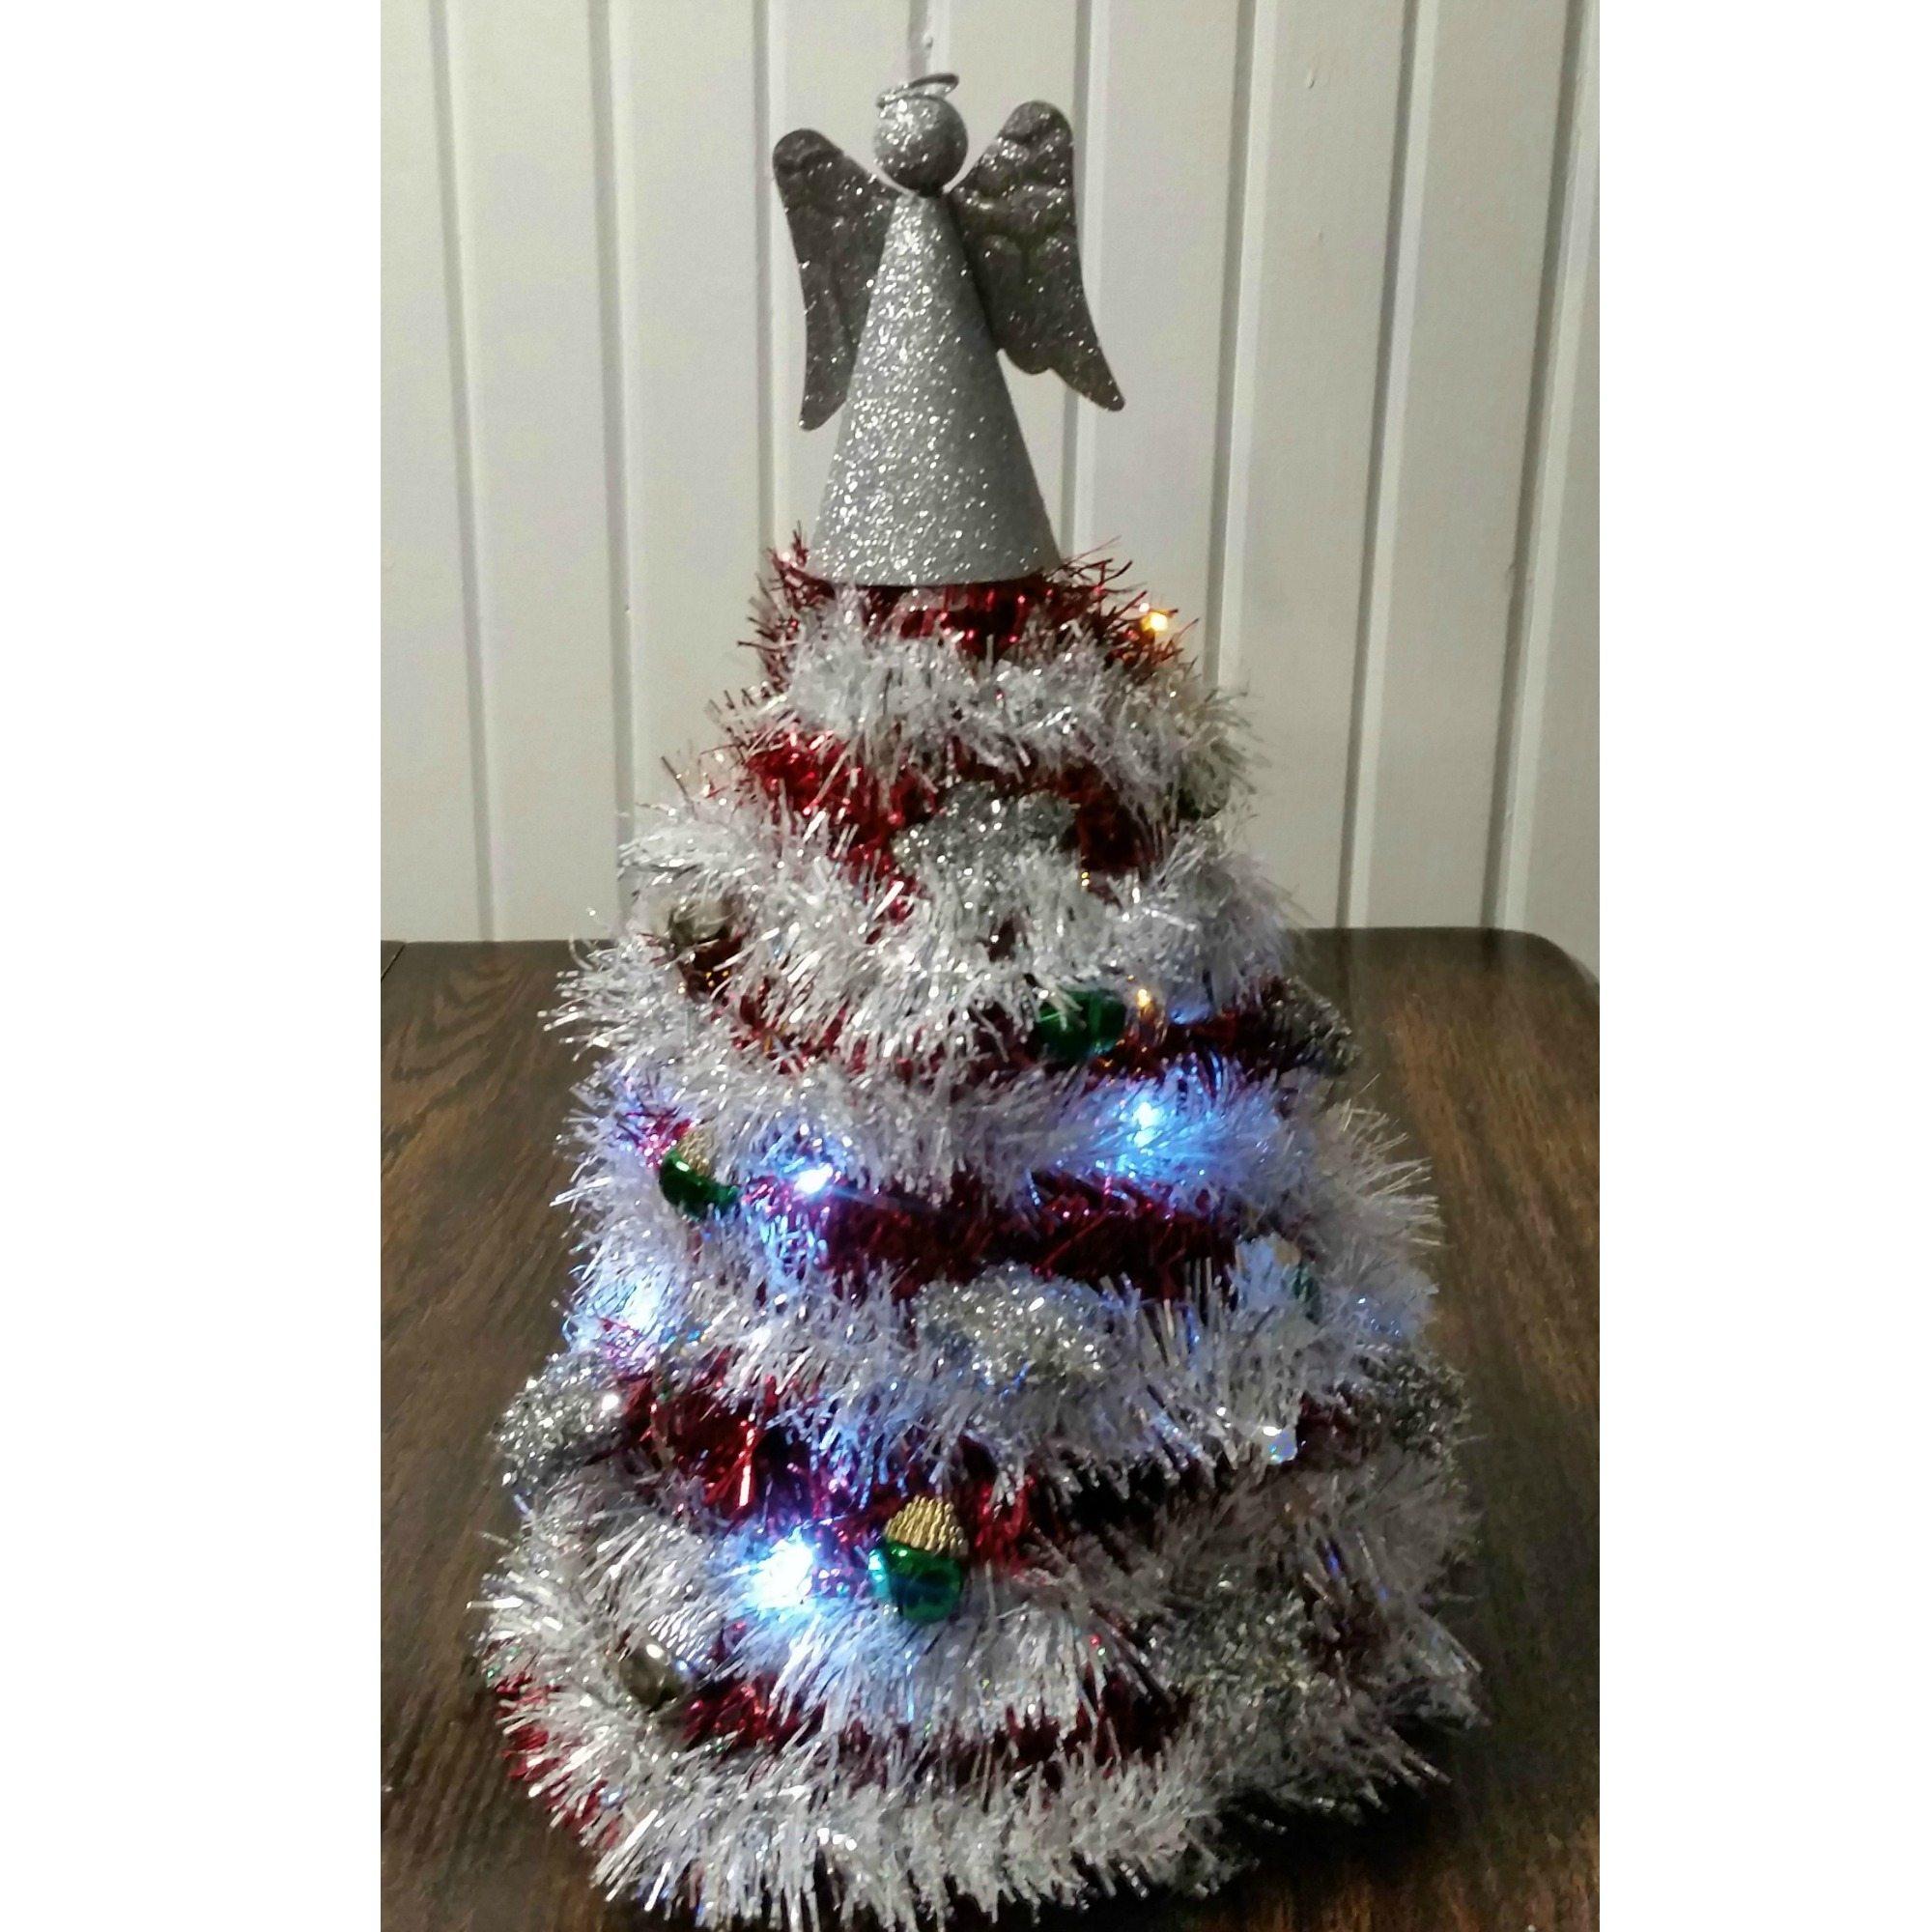 dollar store garland christmas tree my repurposed life - Dollar Store Christmas Tree